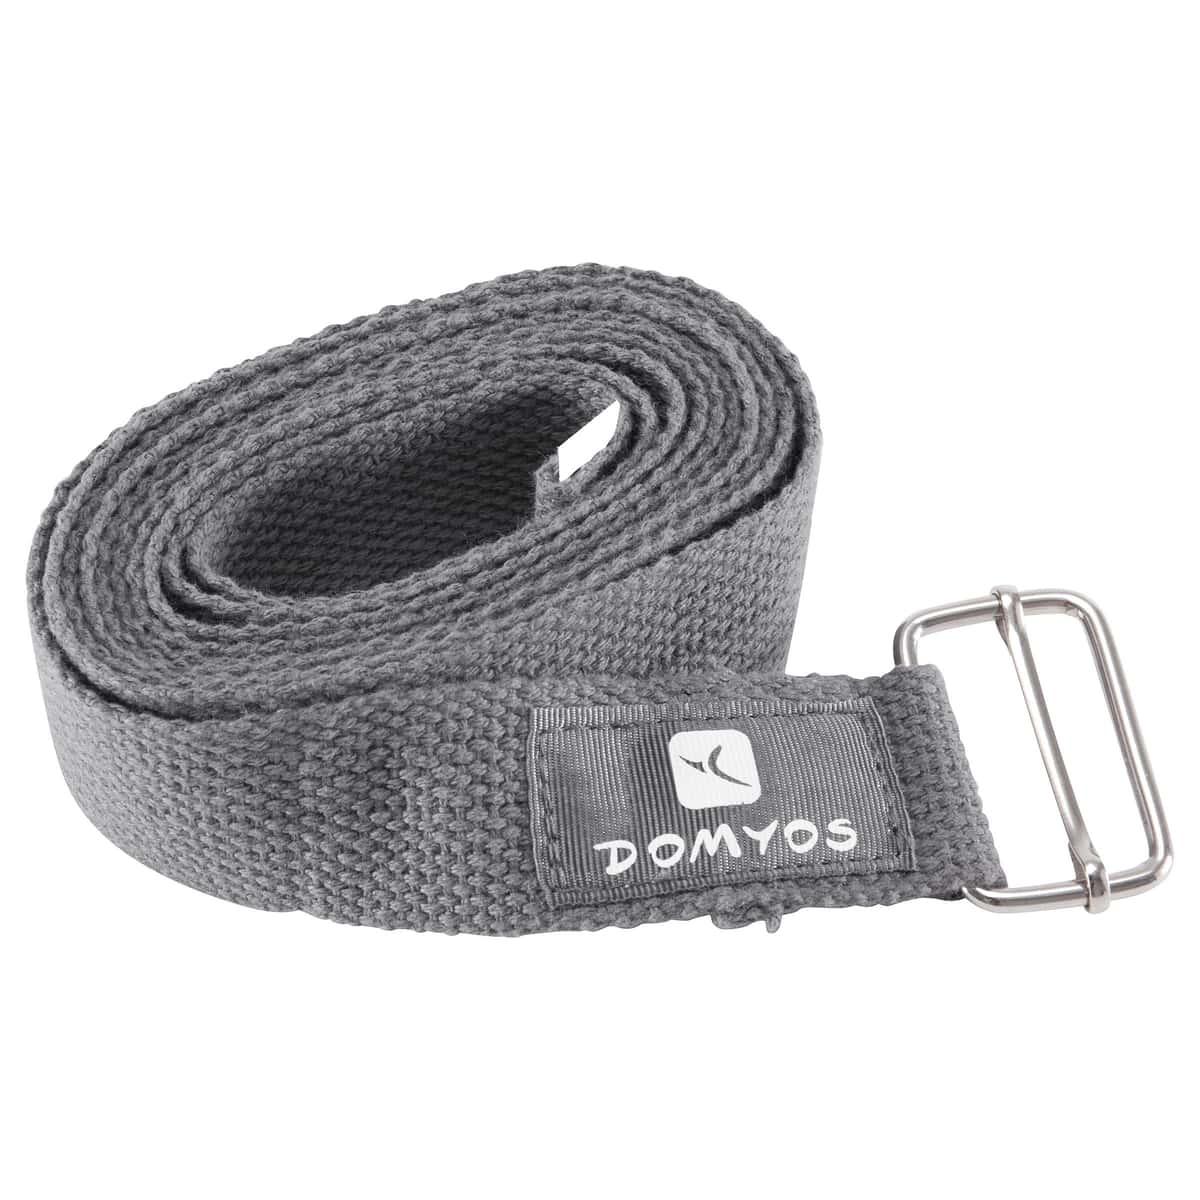 yoga straps